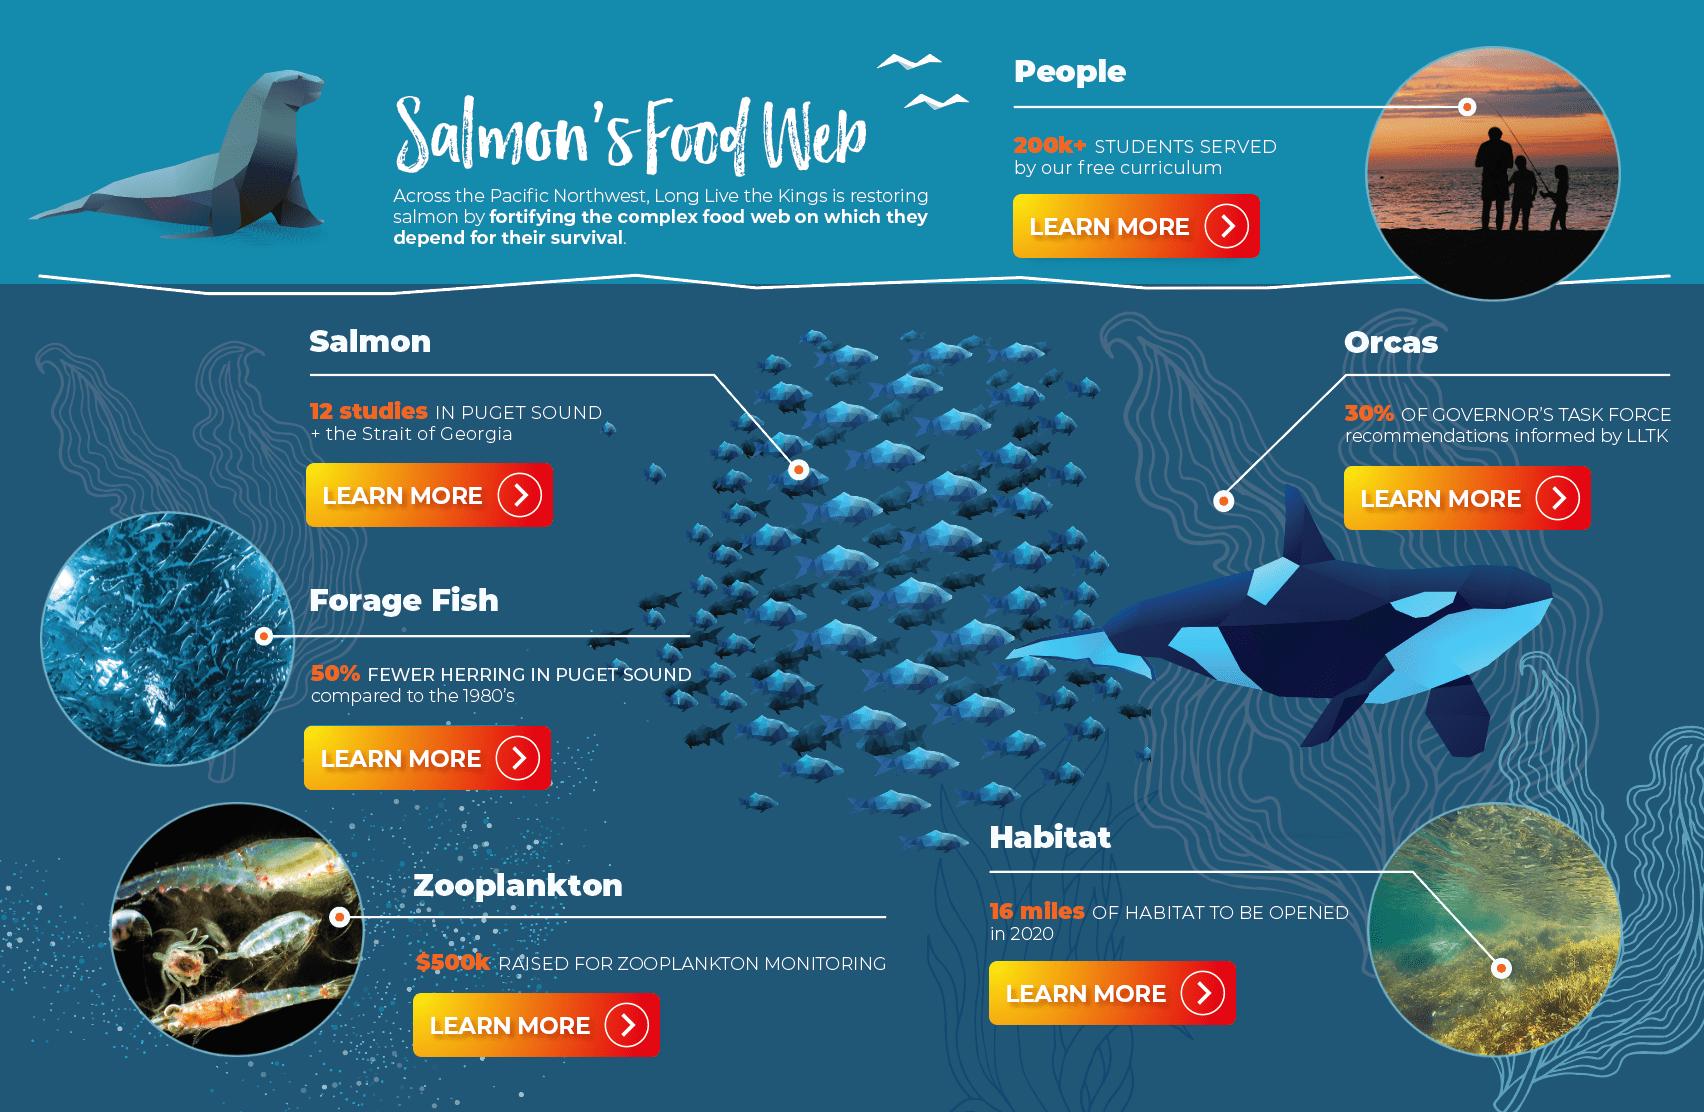 Salmon's Food Web